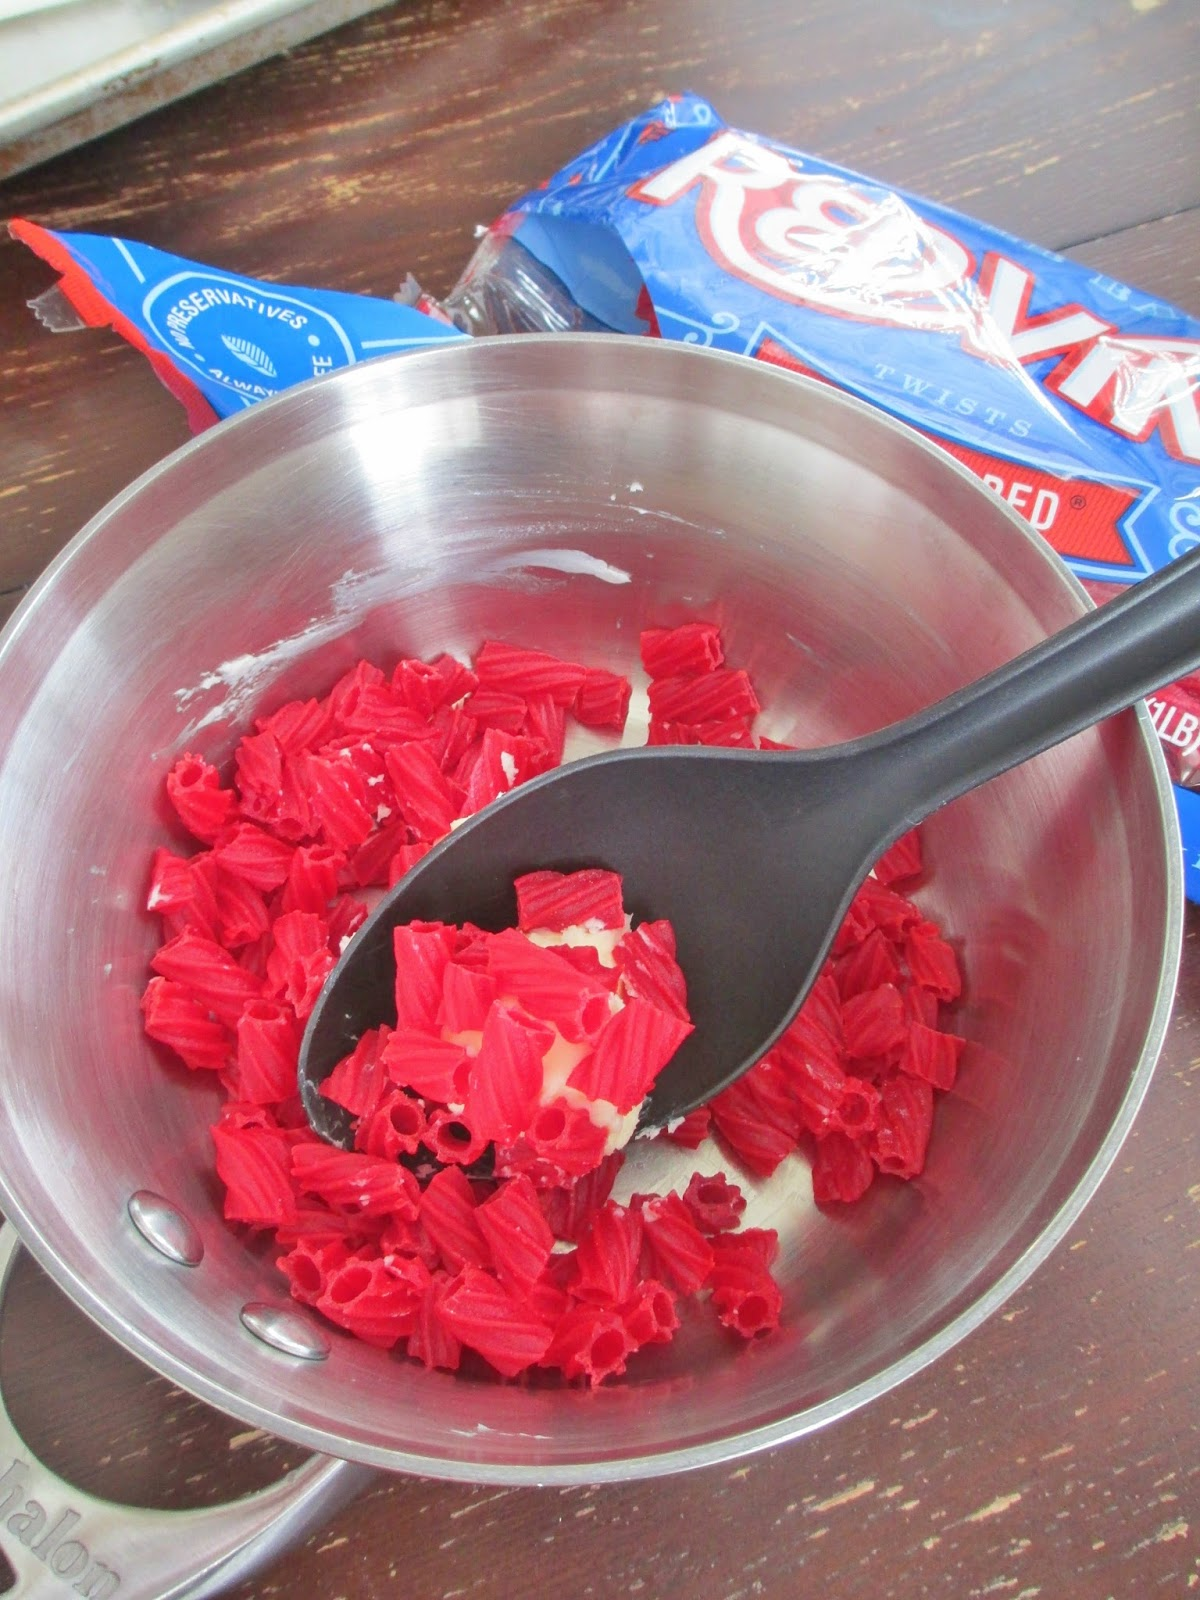 Make Red Vine Icing